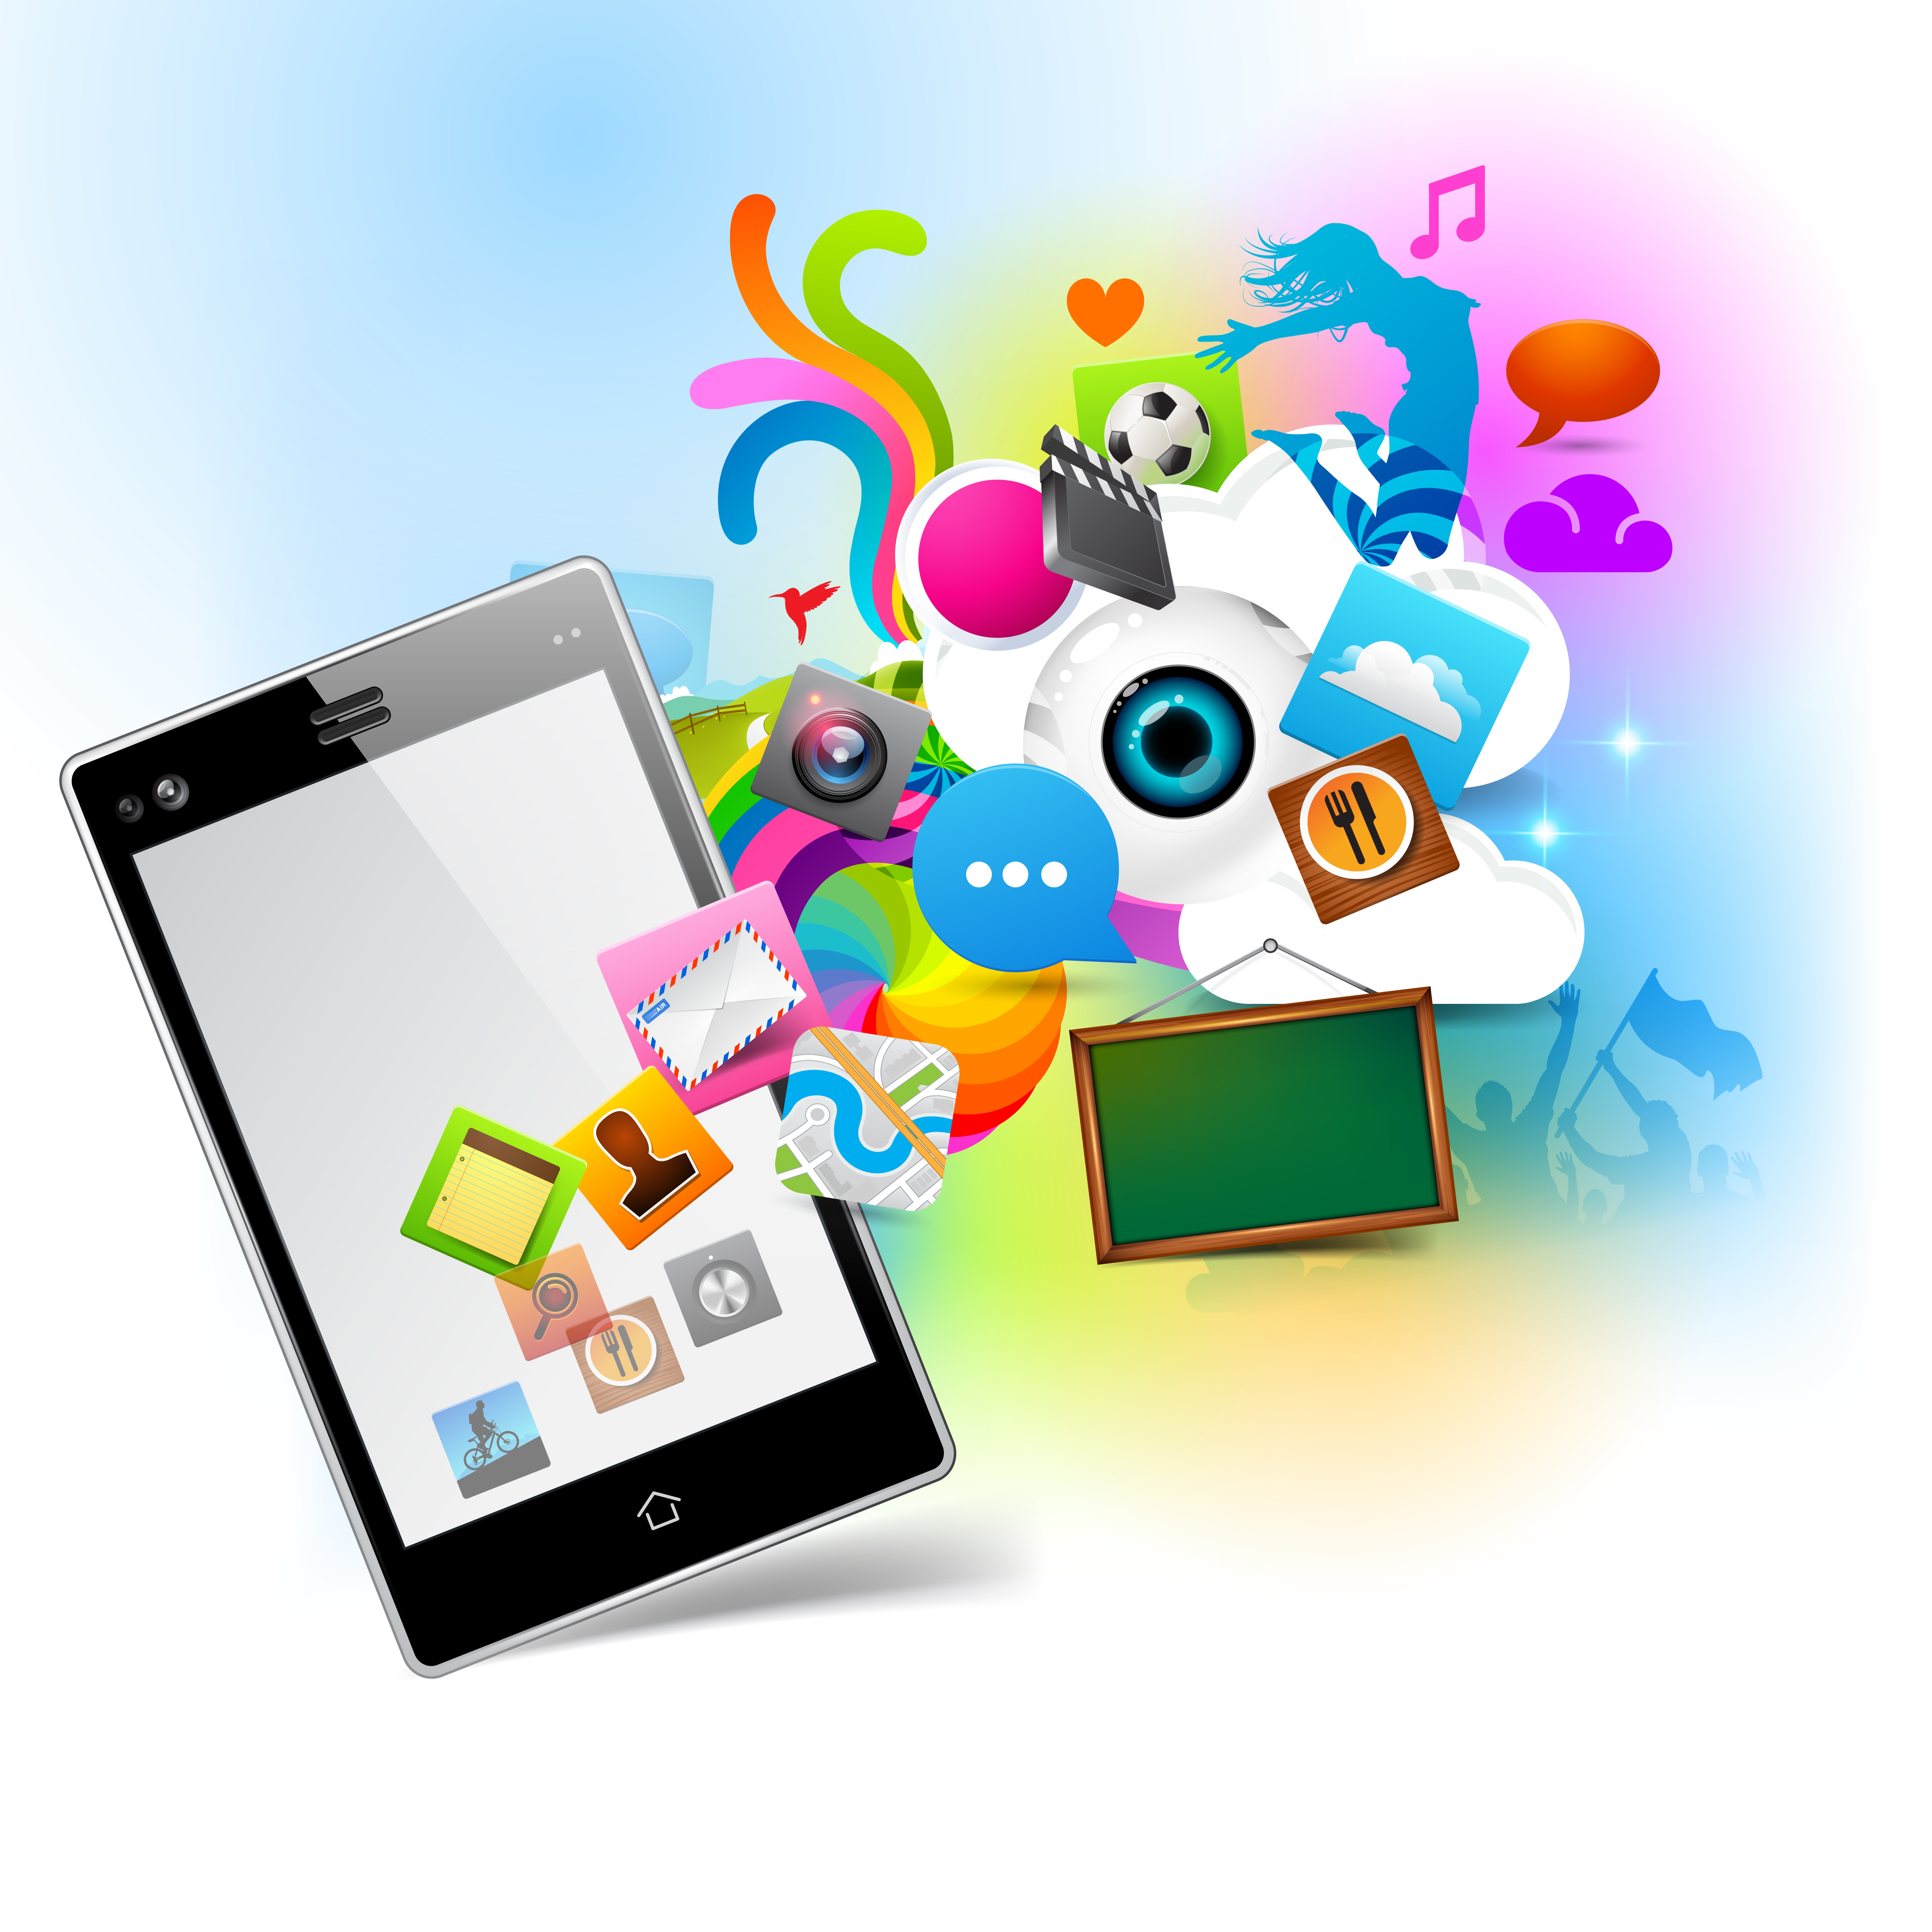 Techbology clipart image transparent Free Technology Education Cliparts, Download Free Clip Art ... image transparent